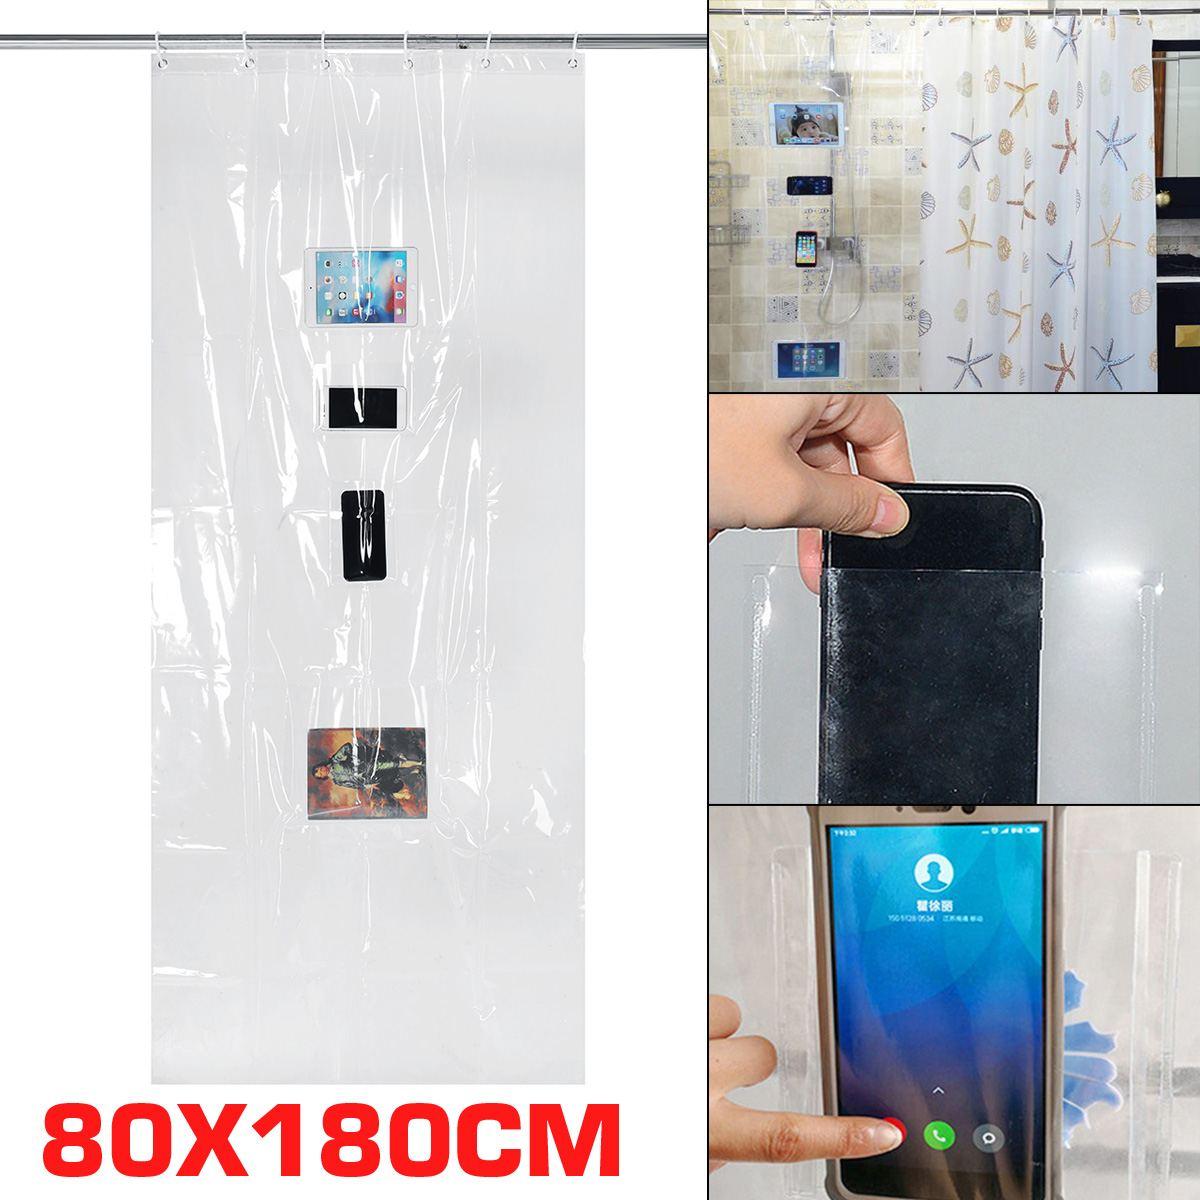 Personalizado baño almacenamiento ducha cortina impermeable transparente Cortina de ducha 80X180CM 4 bolsillos PVC Cortina de ducha